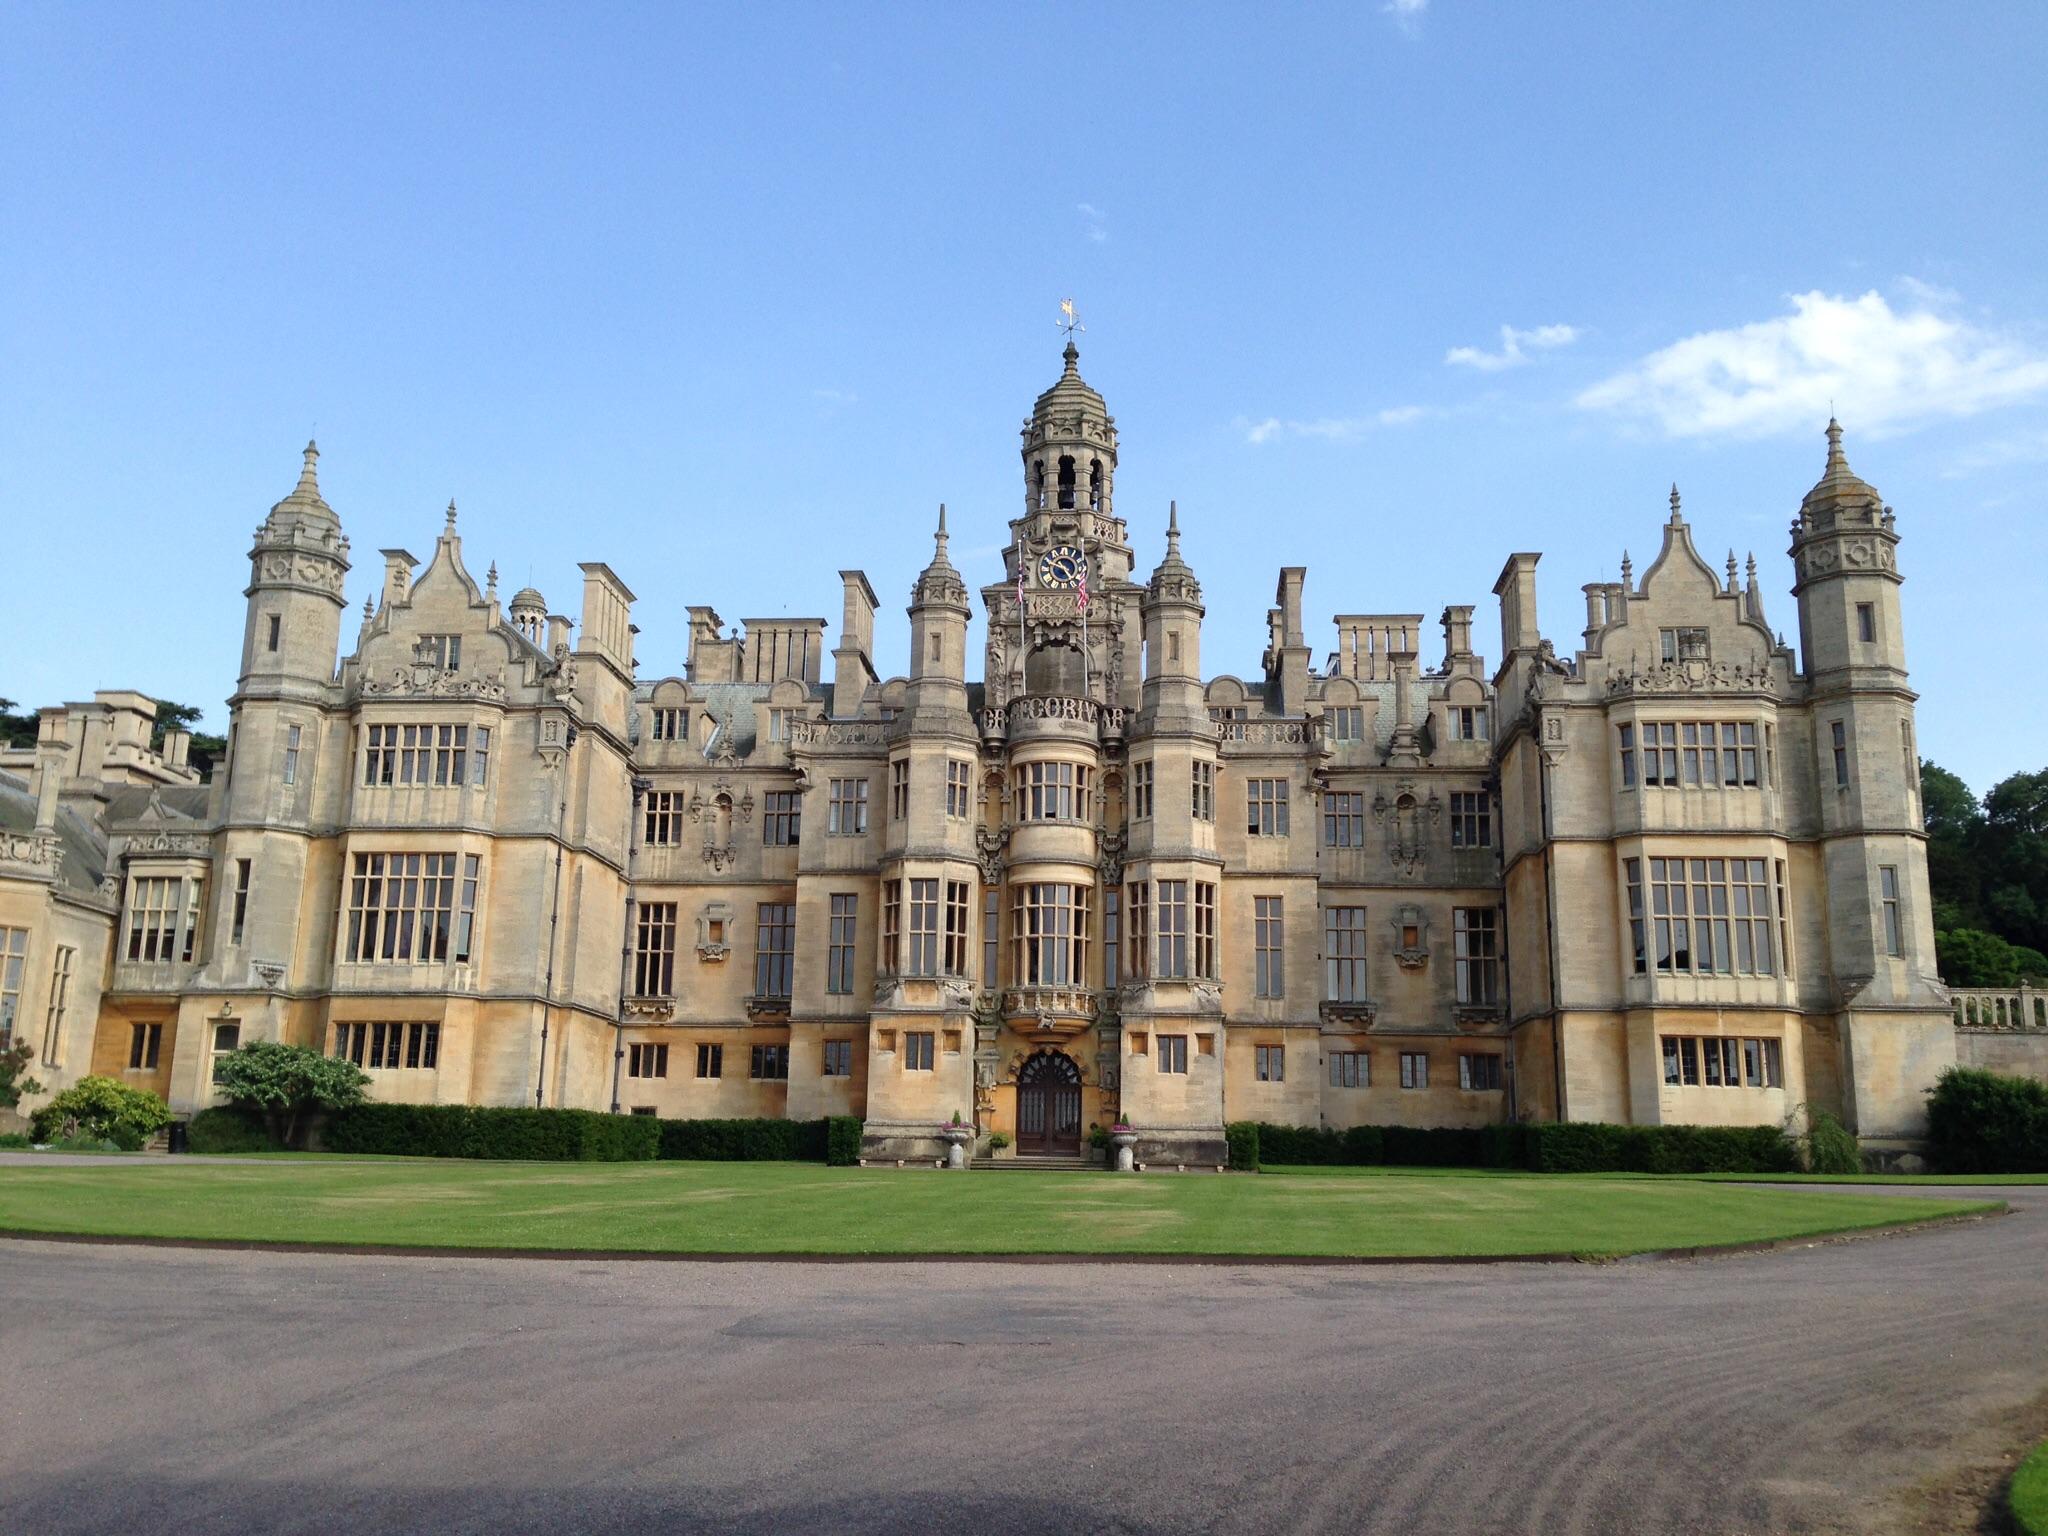 The Harlaxton Manor